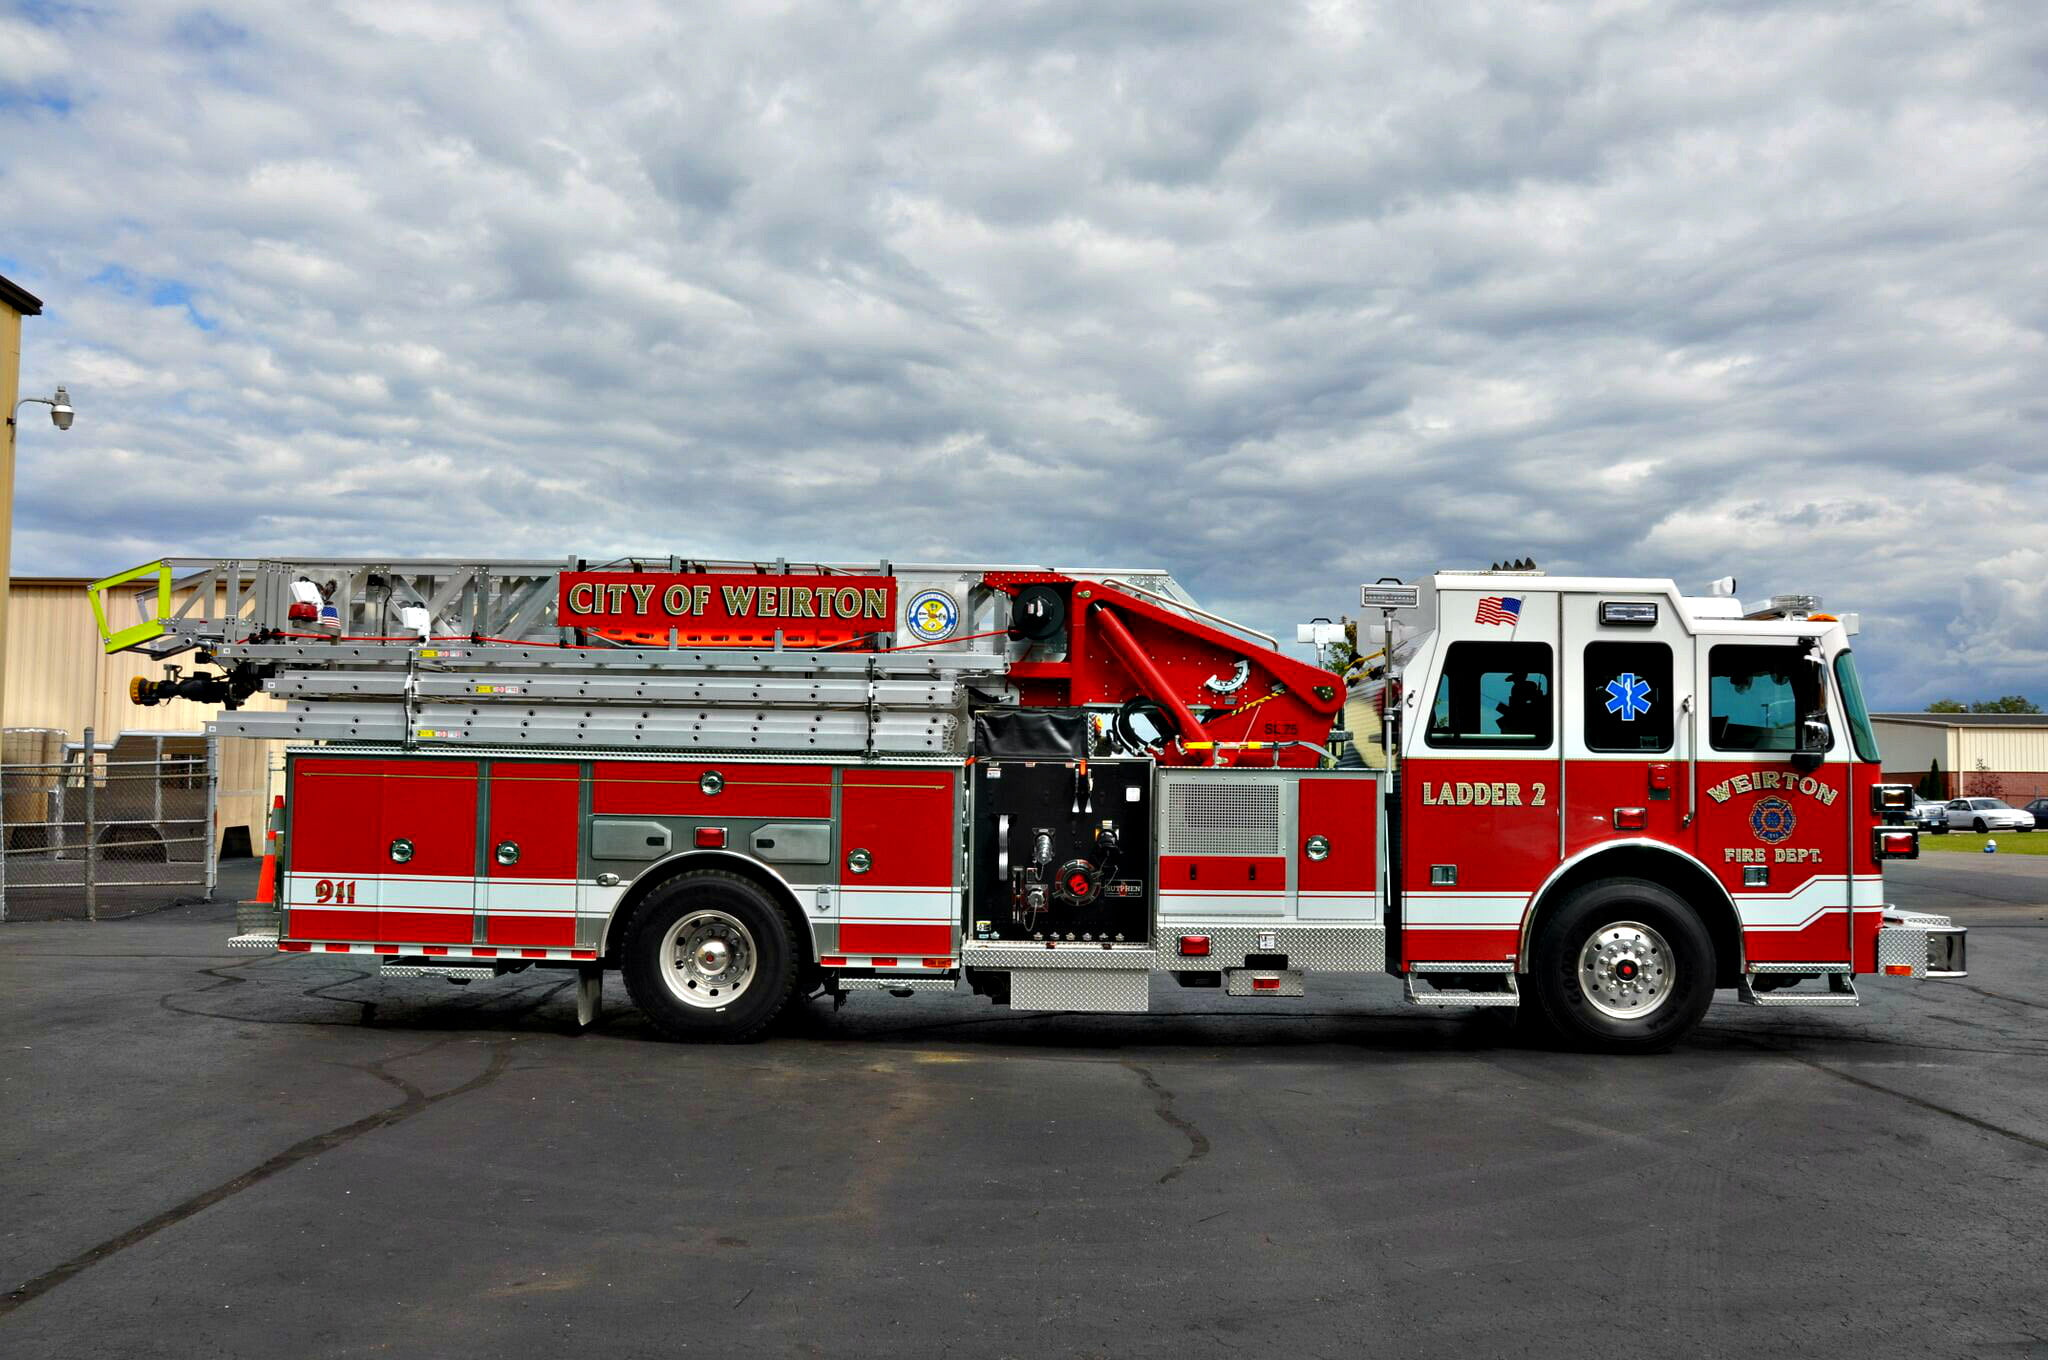 SL 75 Aerial Ladder, Weirton, WV